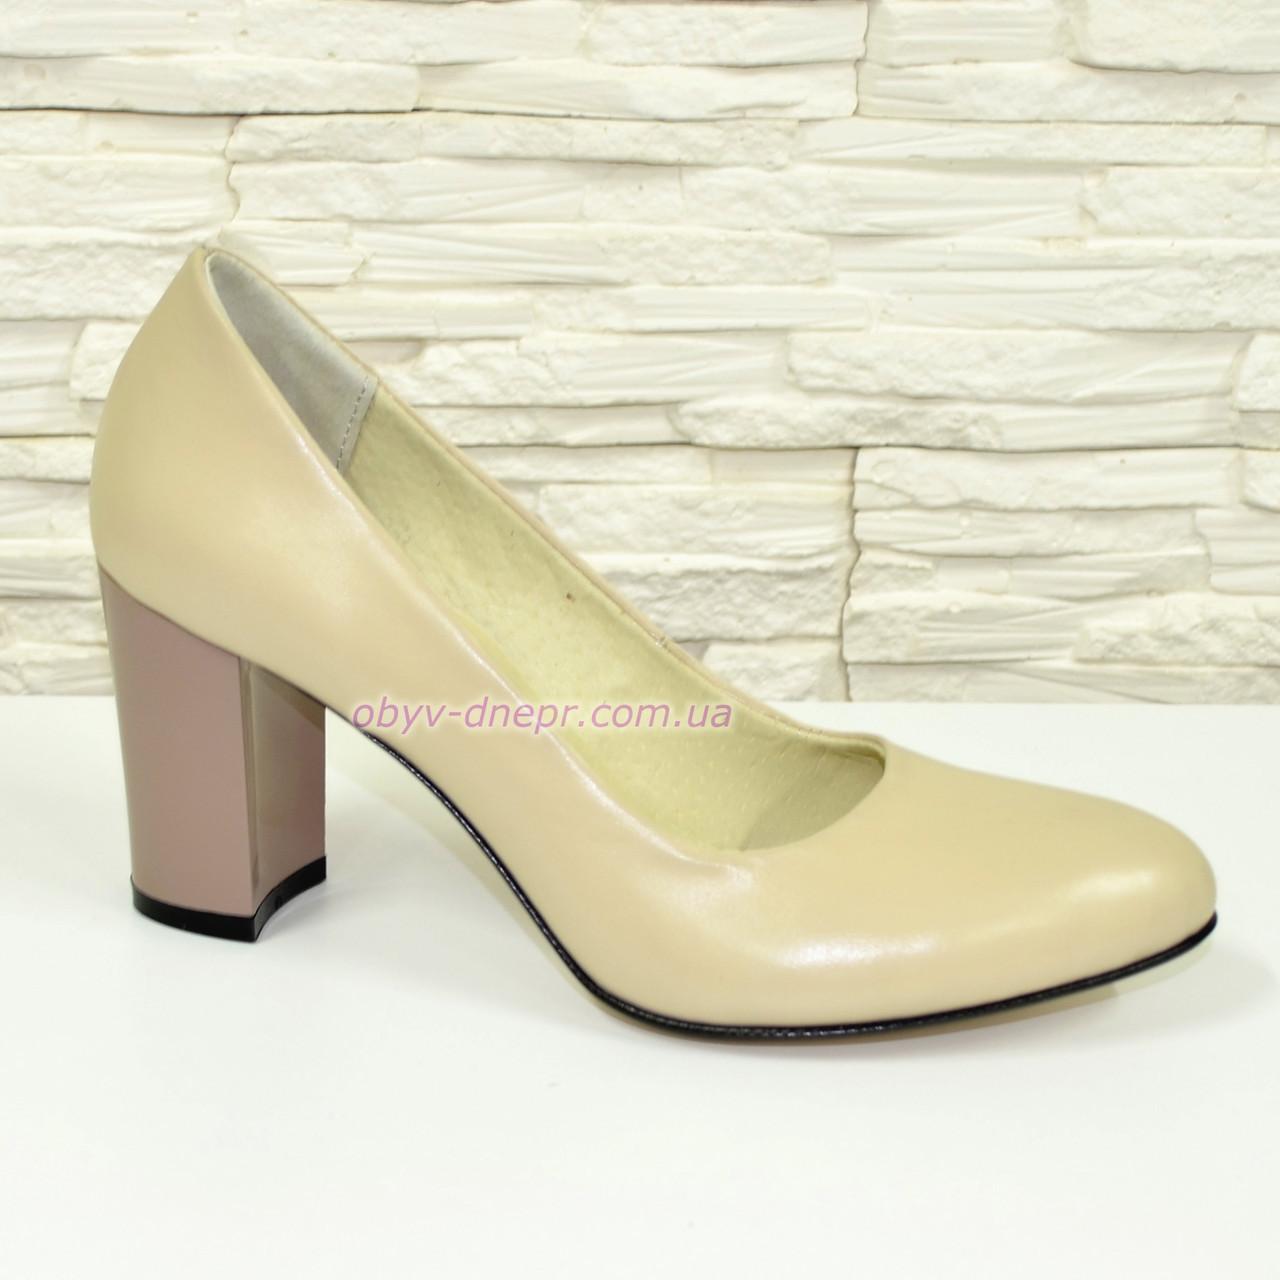 "Женские кожаные классические туфли на каблуке, бежевого цвета. ТМ ""Maestro"""